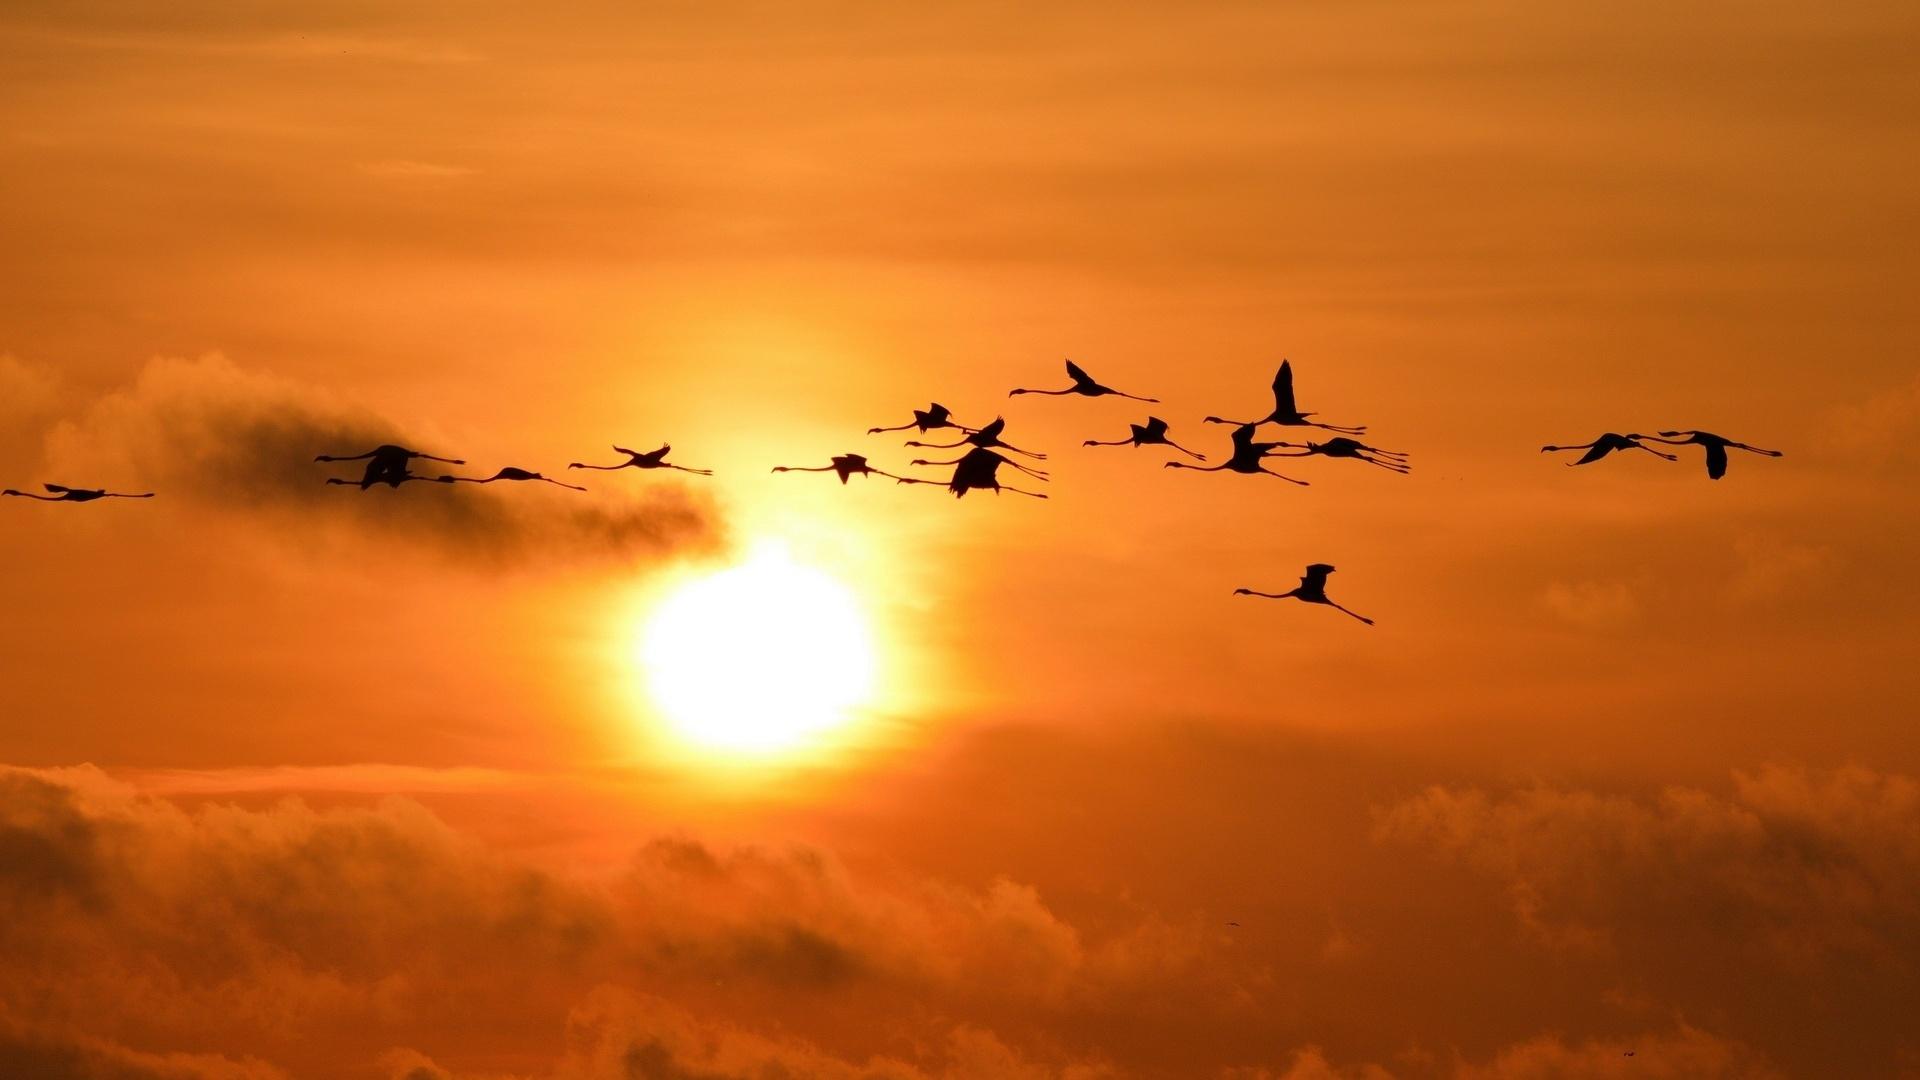 Wedge Birds In The Sky wallpaper for computer